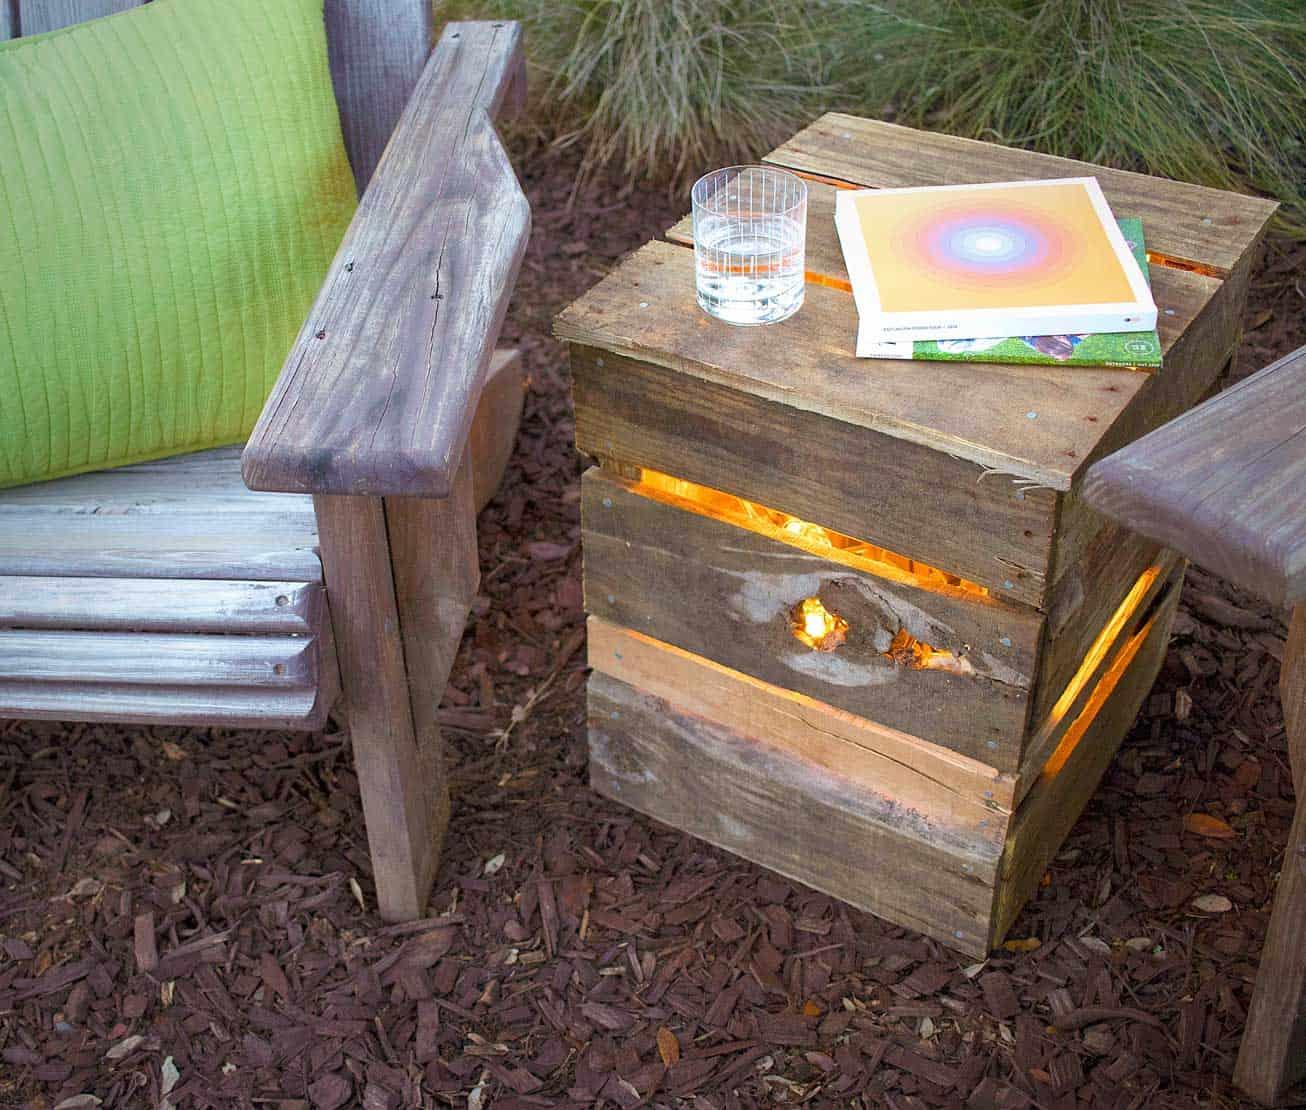 Light-up pallet side table